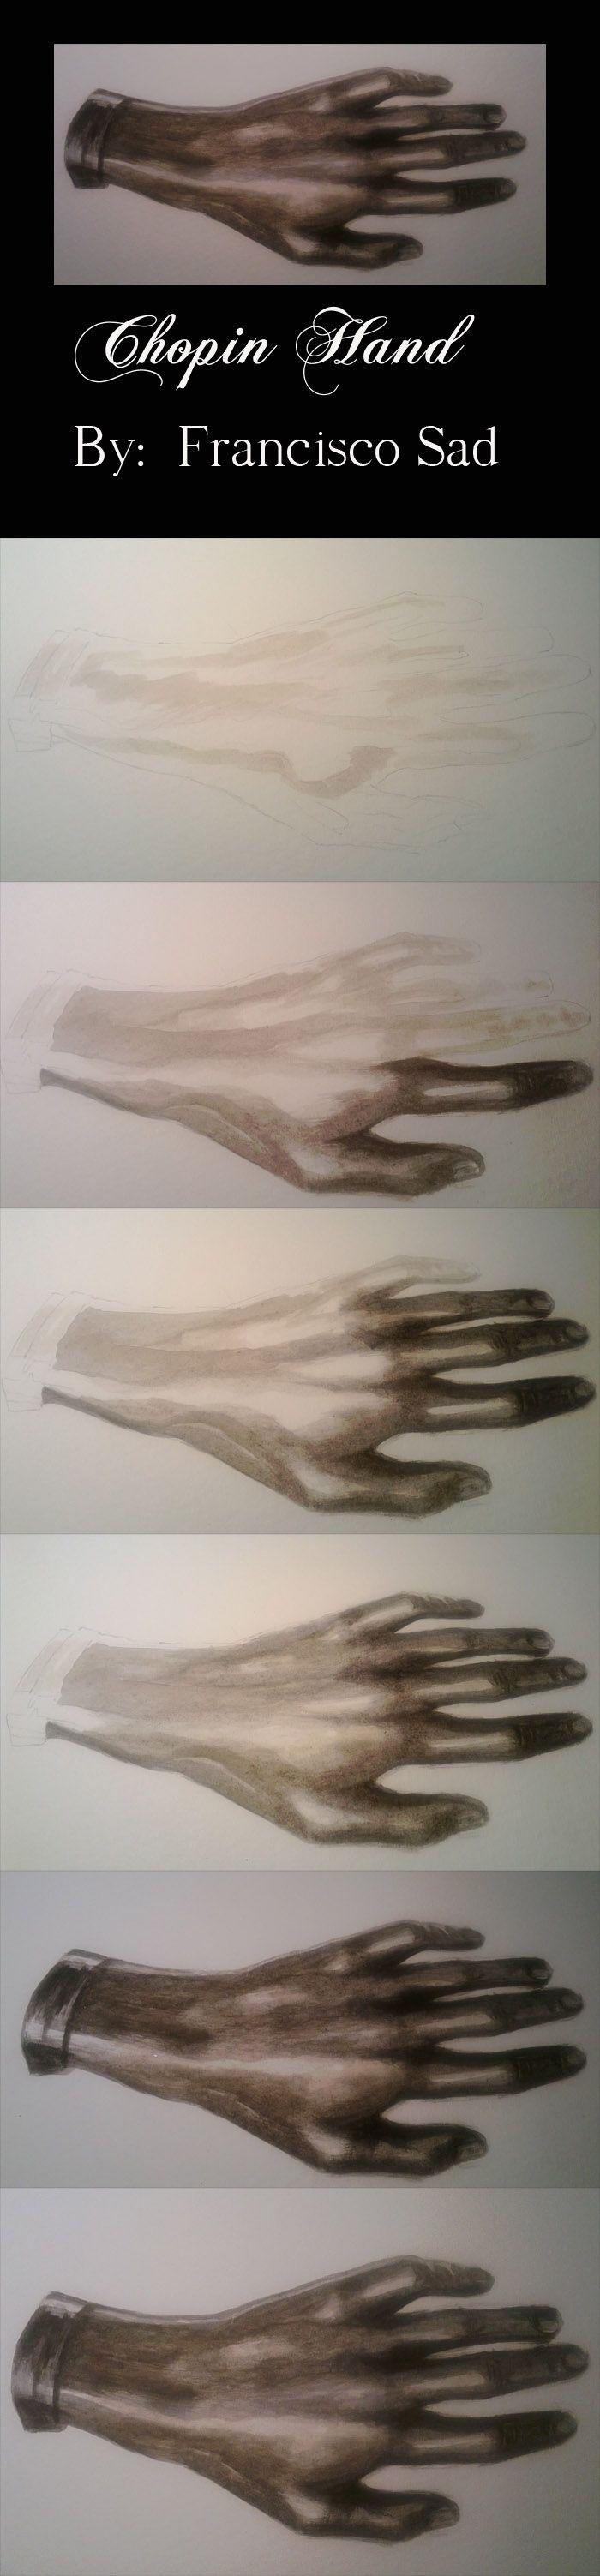 watercolor tutorial chopin hand